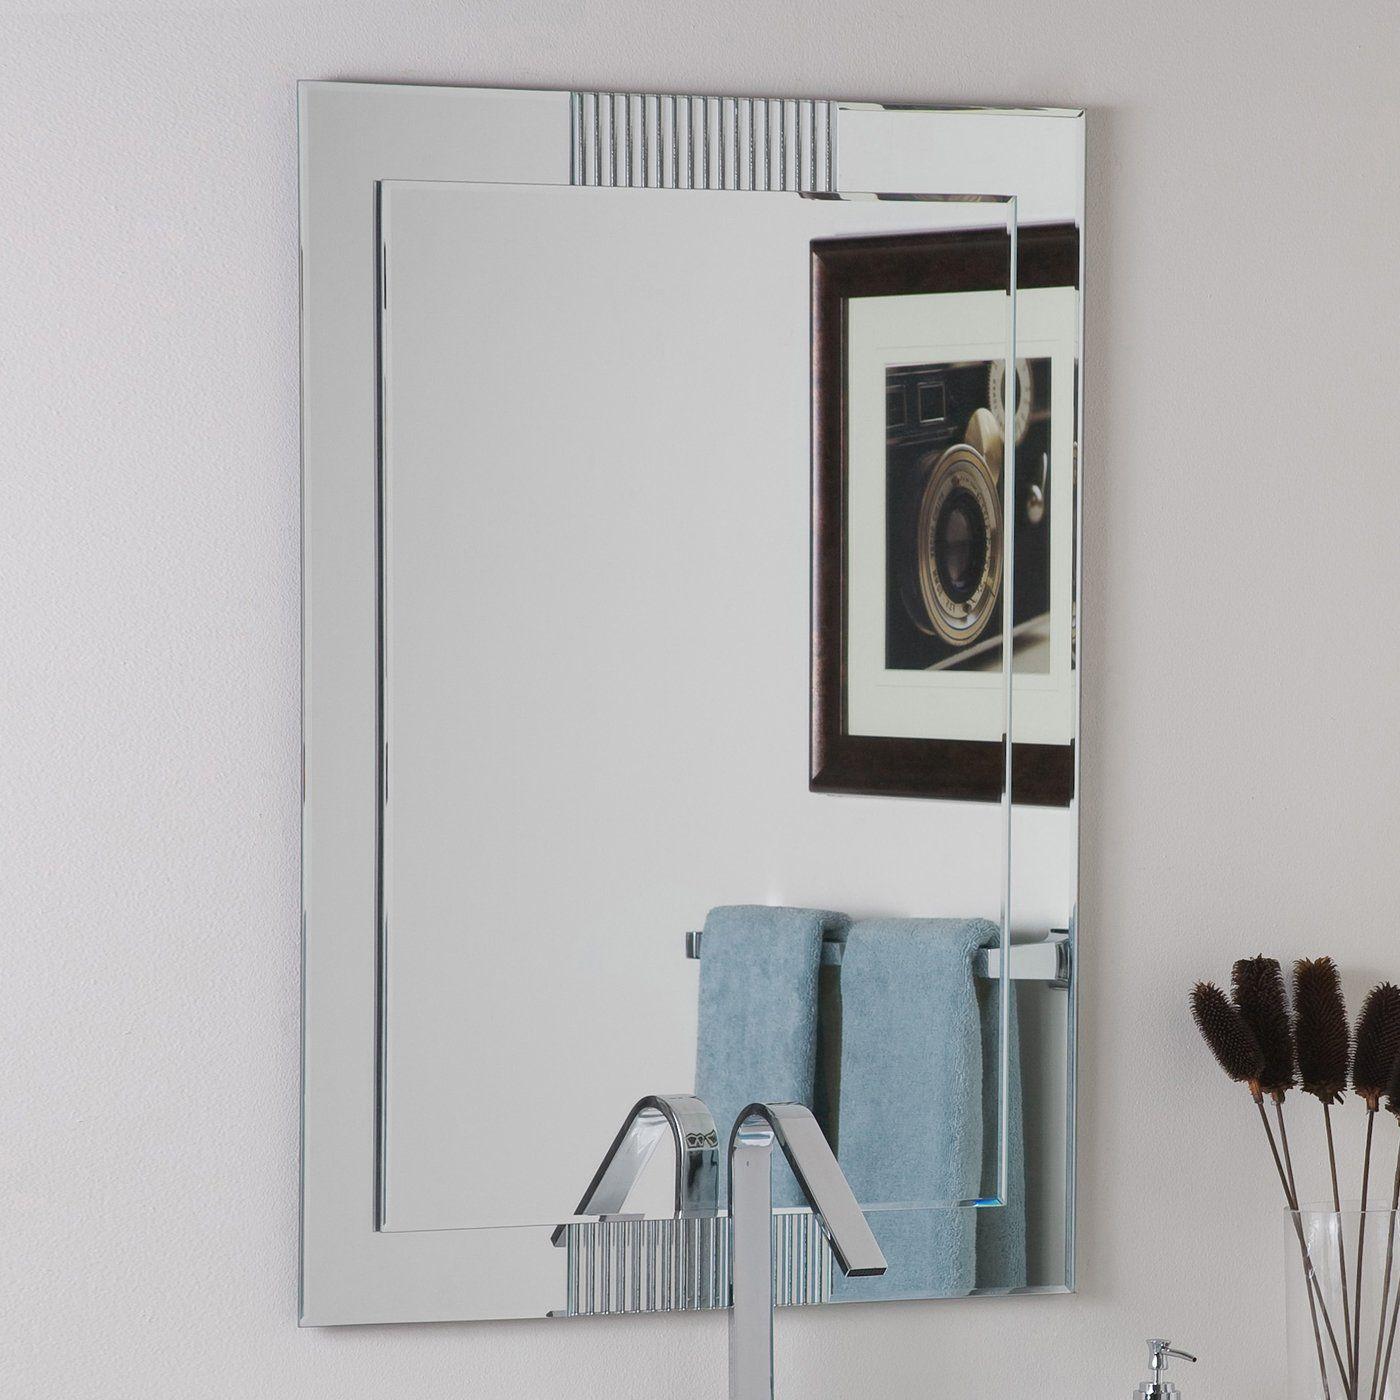 Decor Wonderland Ssm526 Francisco Large Frameless Bathroom